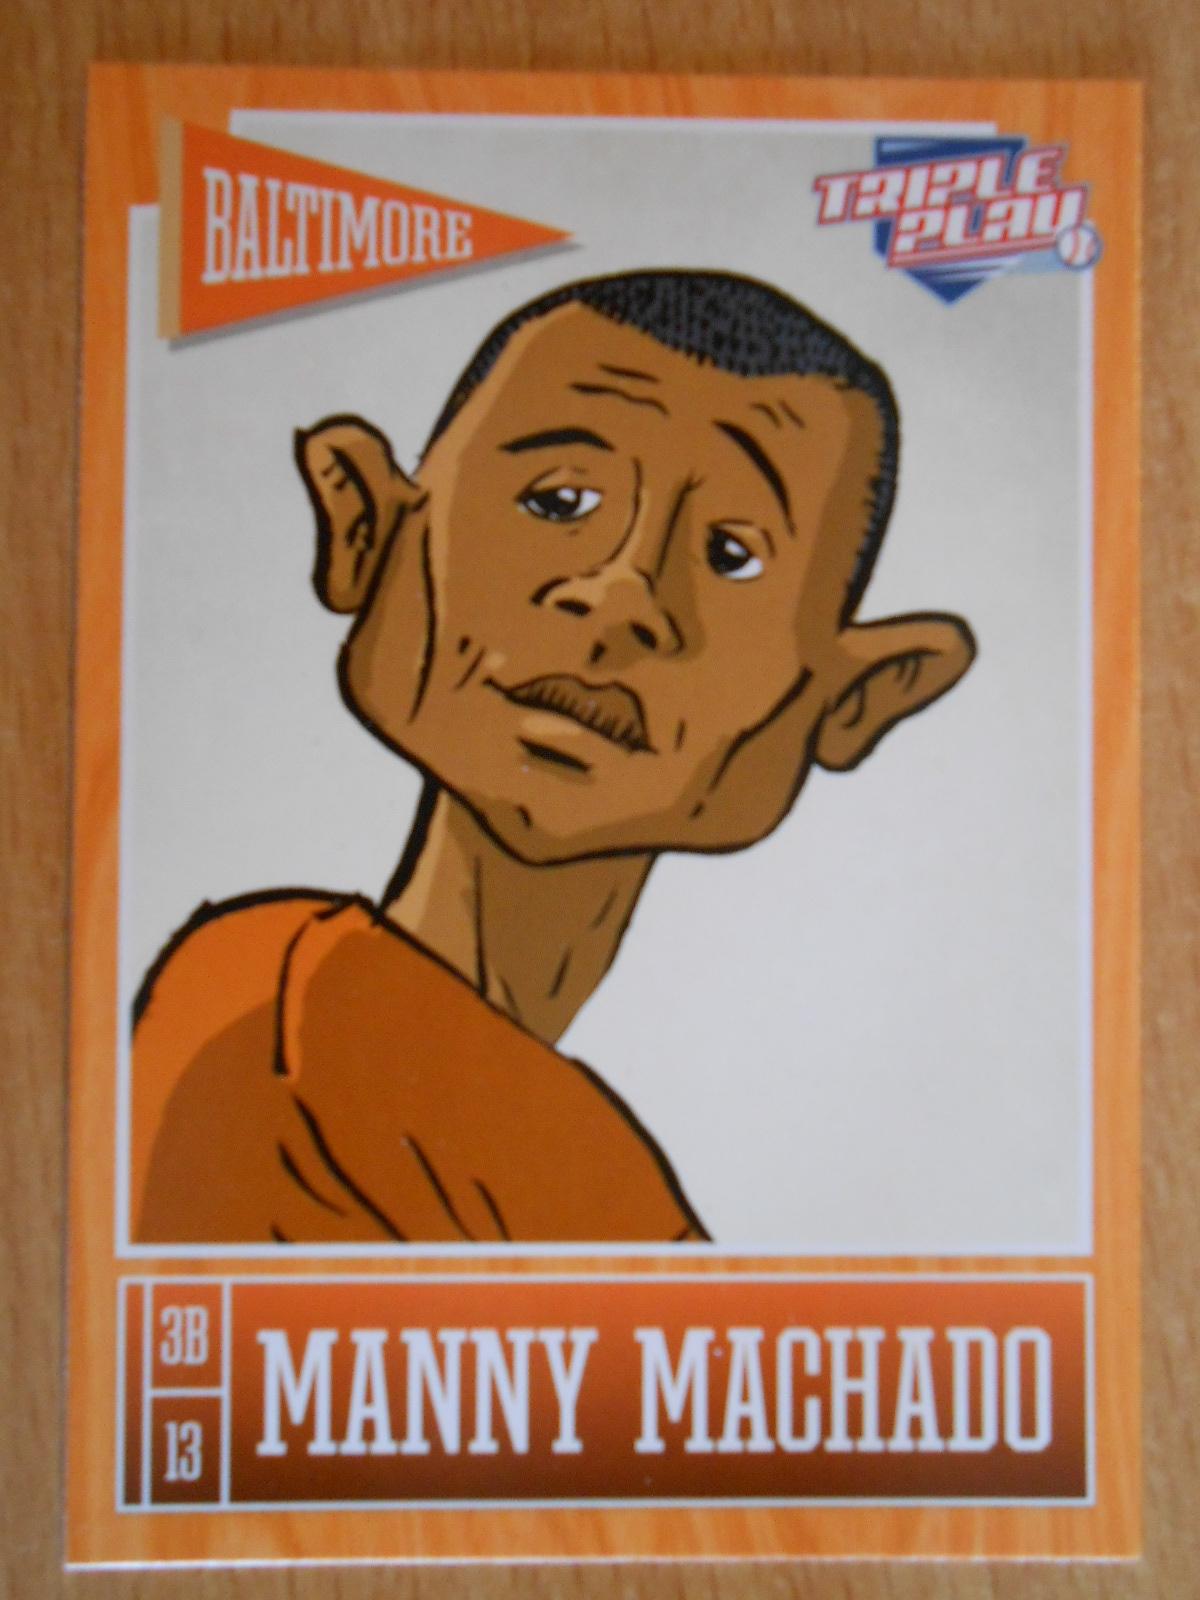 Manny Machado Looks About 75